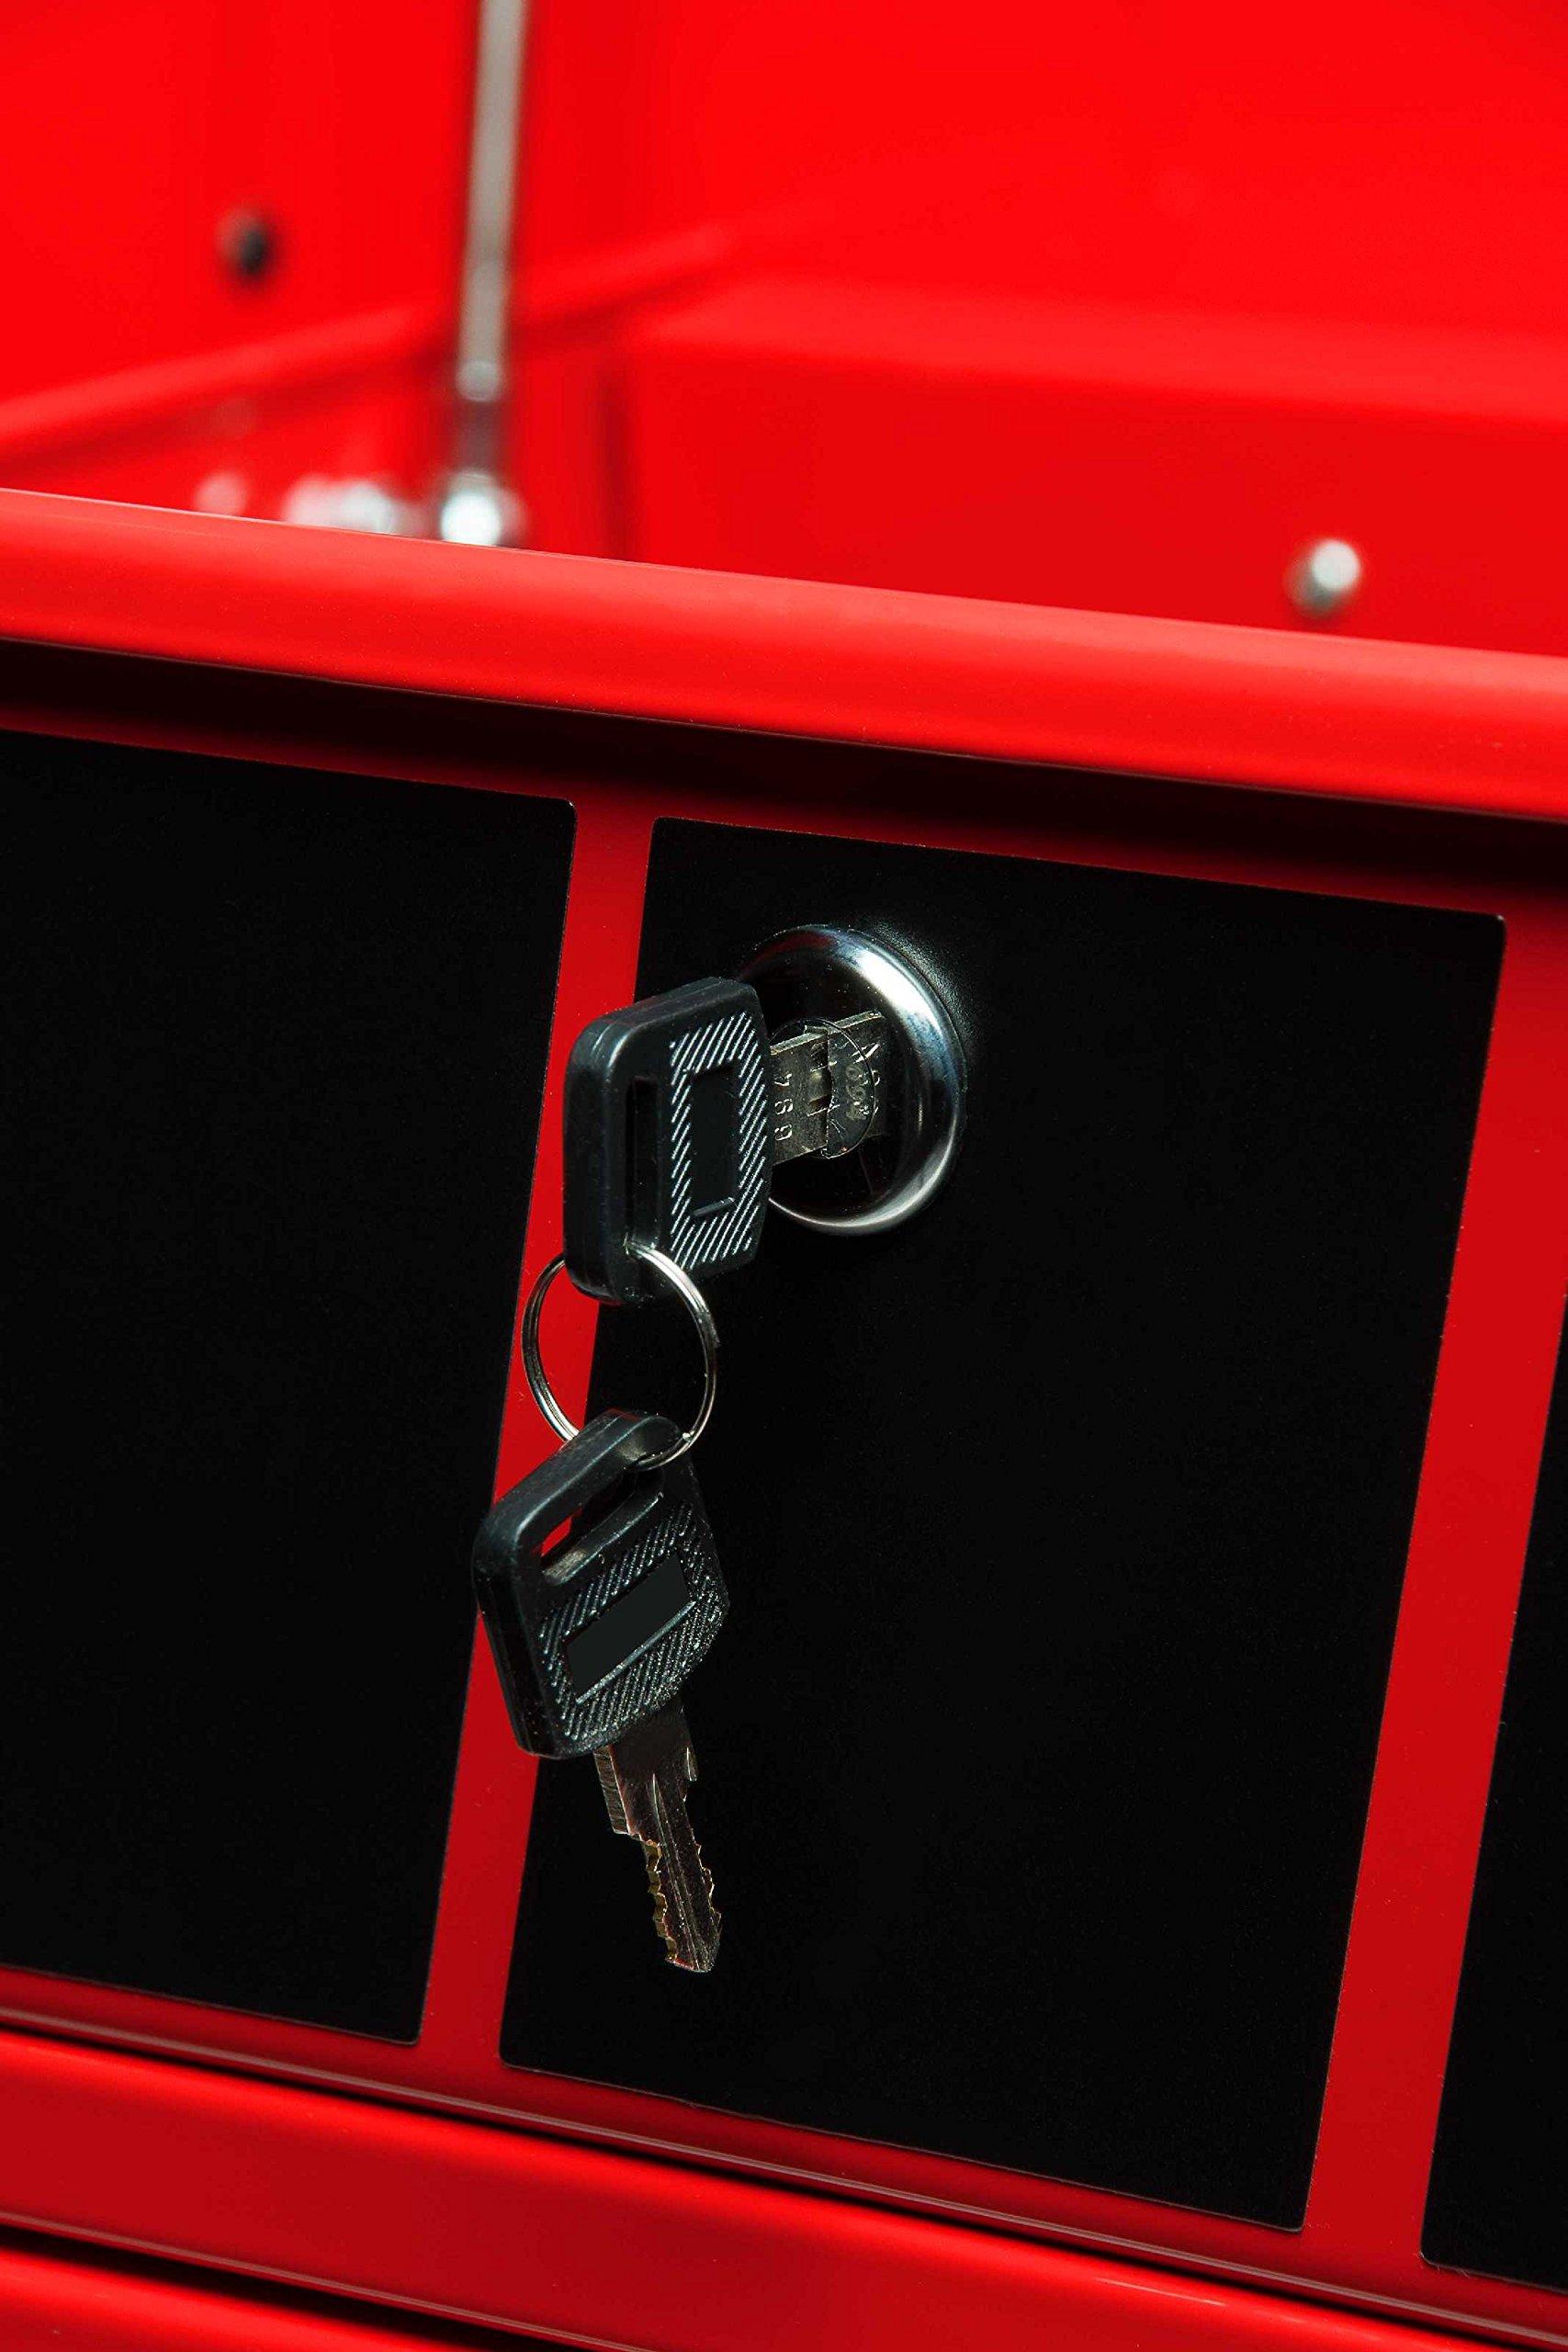 Sunex 8057 Premium Full Drawer Service Red Cart by Sunex Tools (Image #6)